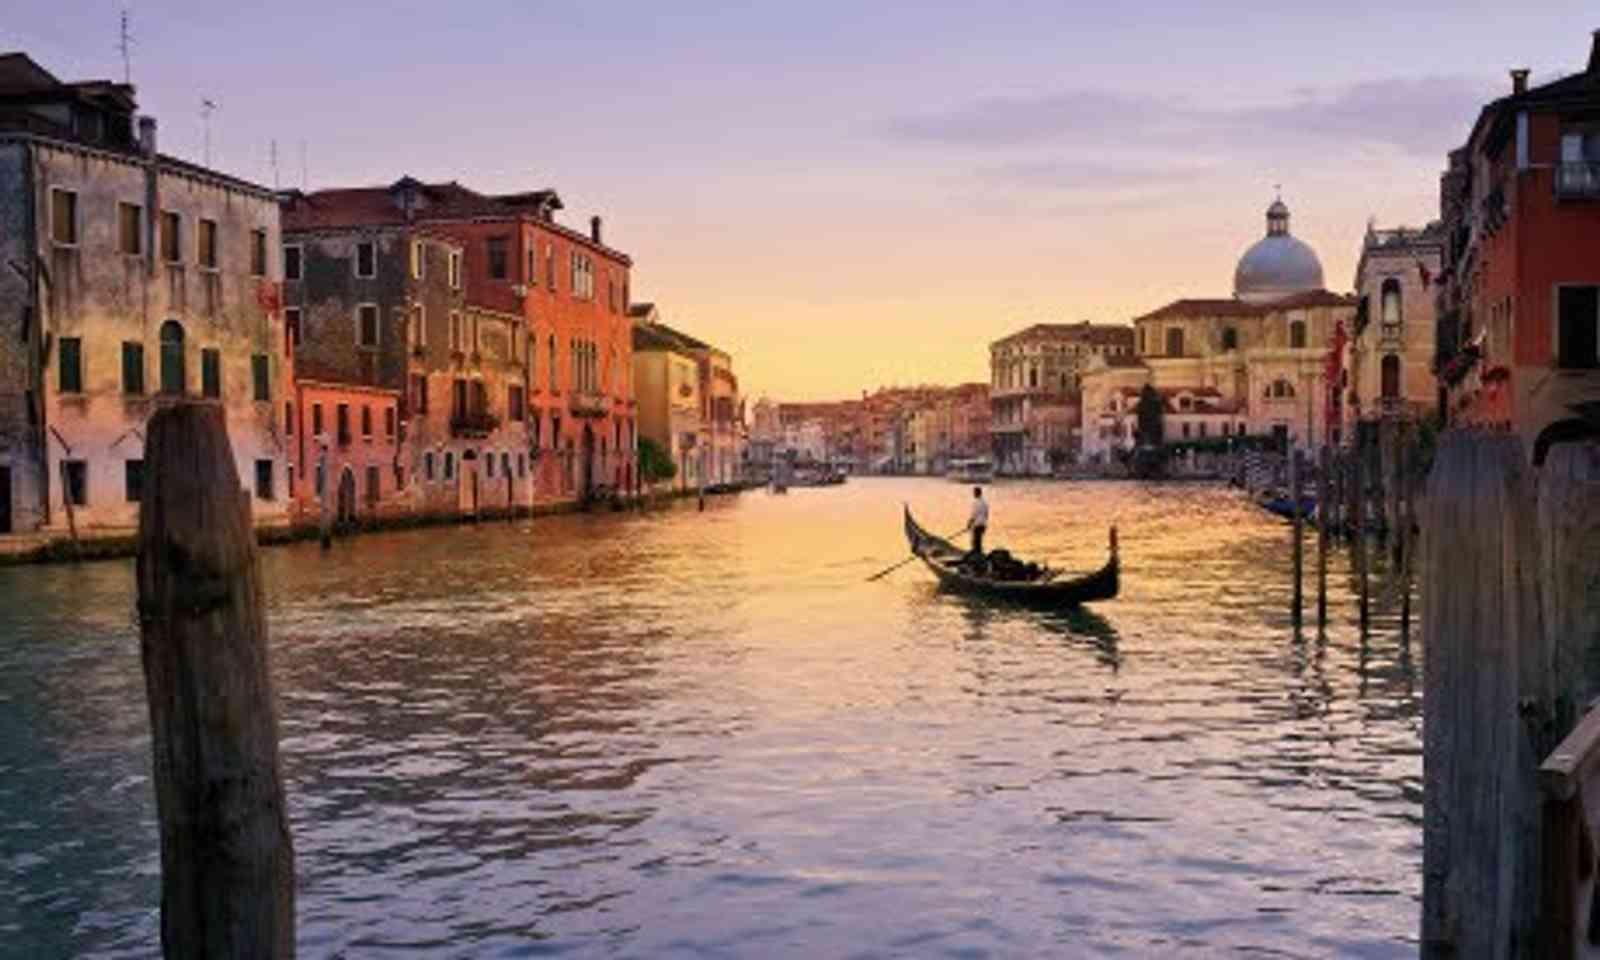 Venice (Wanderlust)